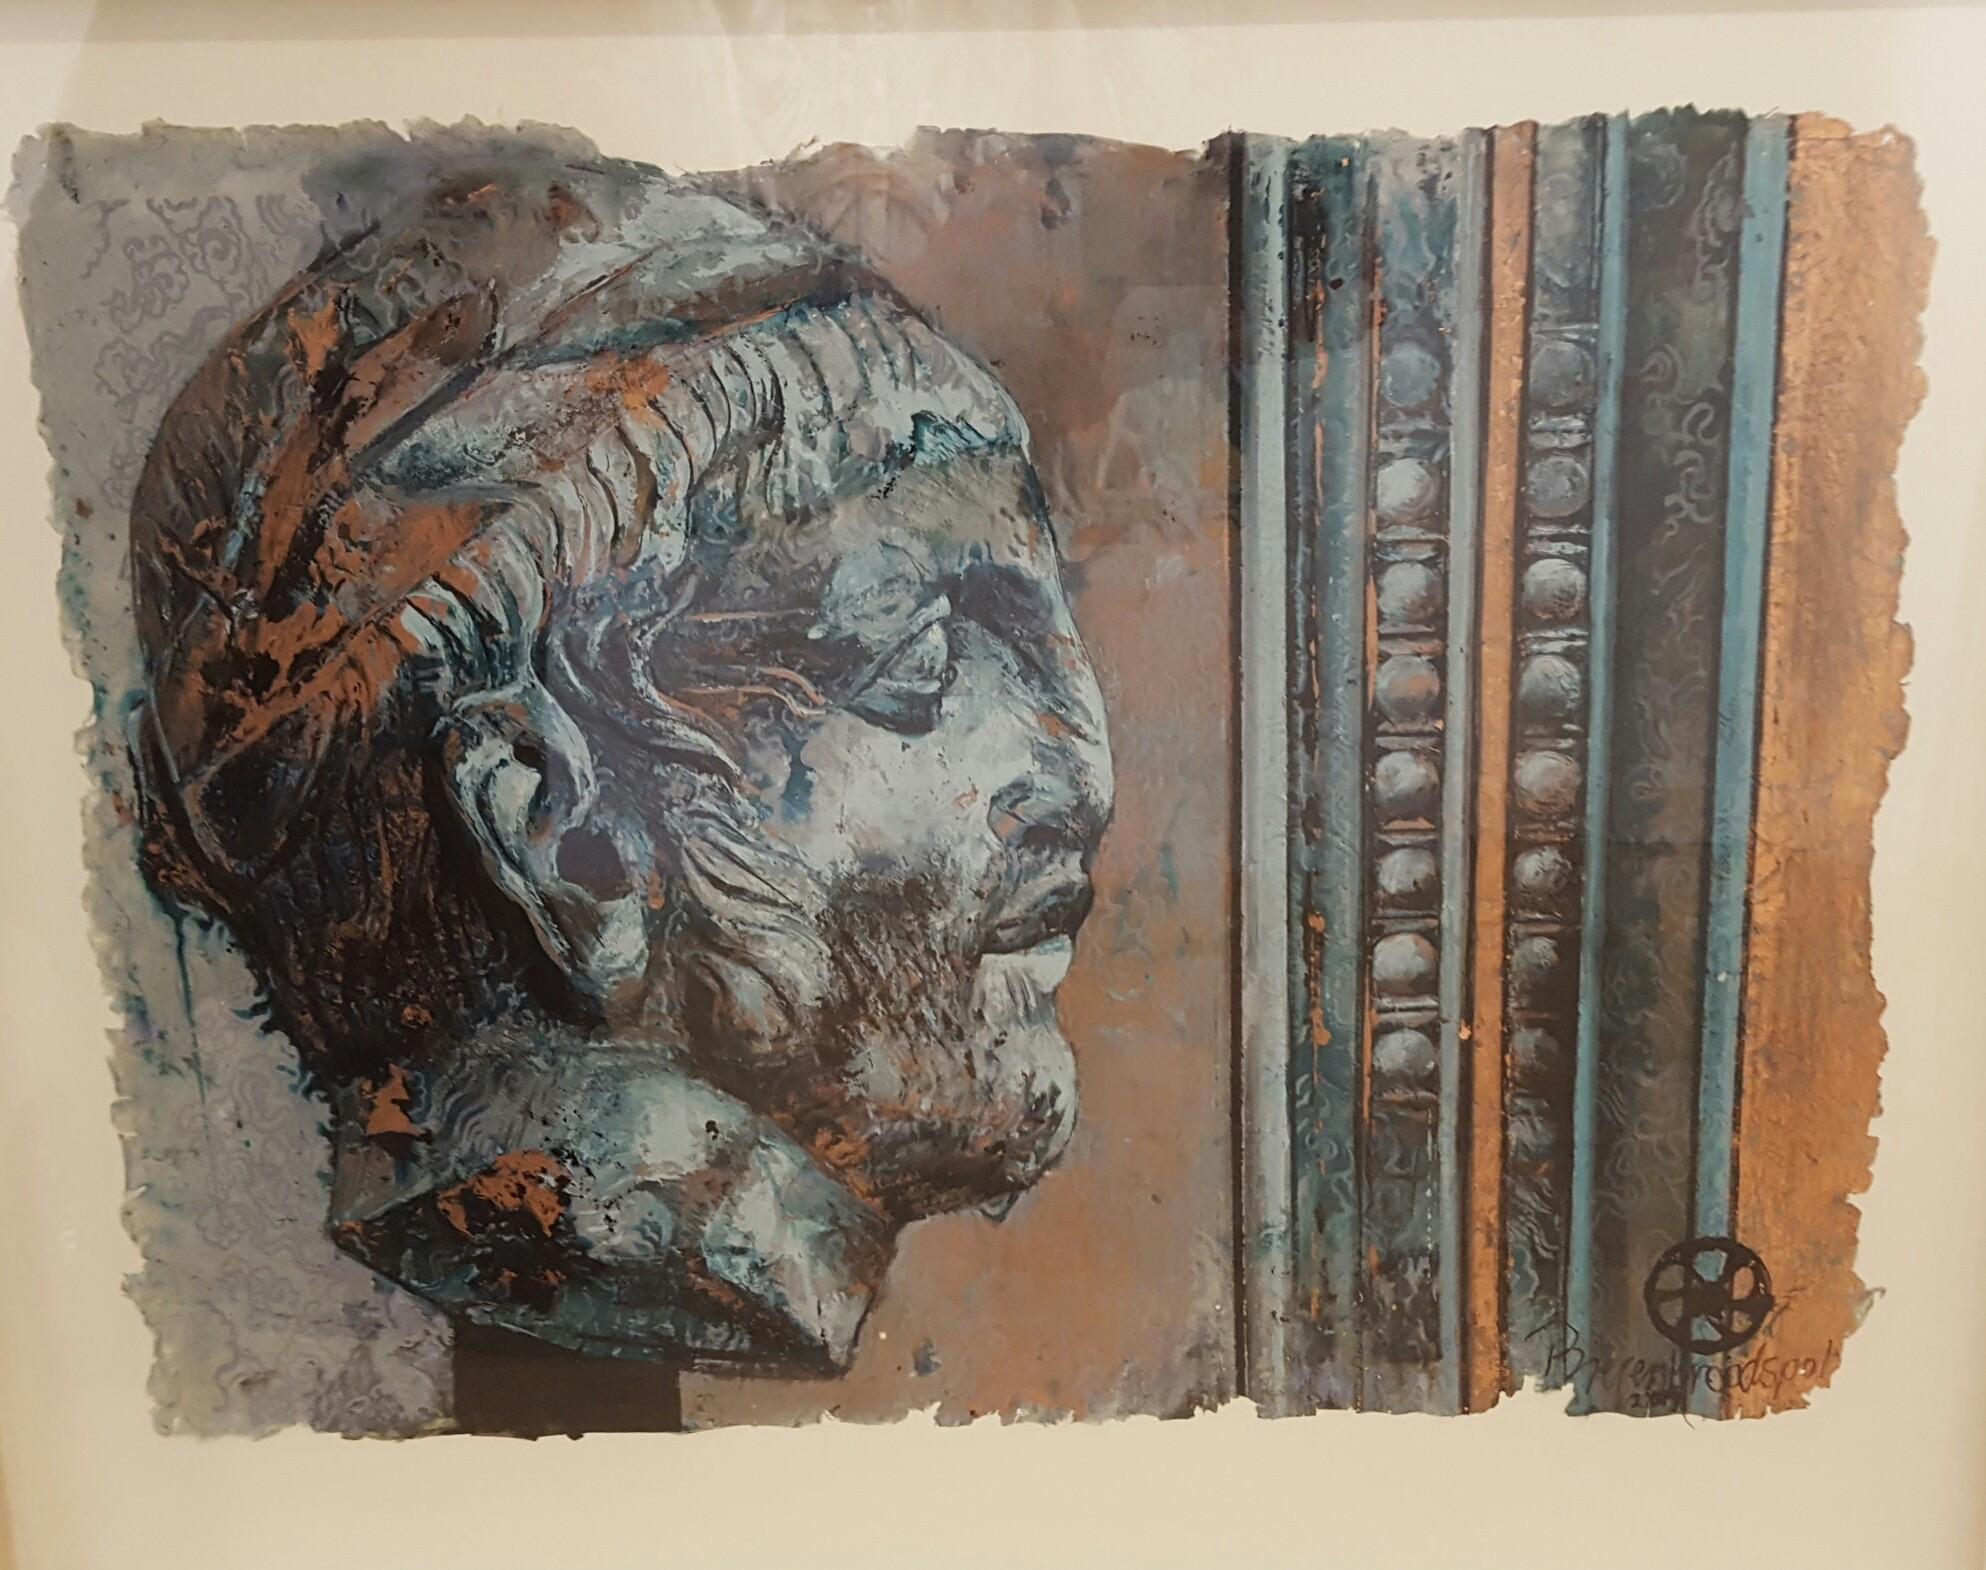 Bierenbroodspot | Pericles II